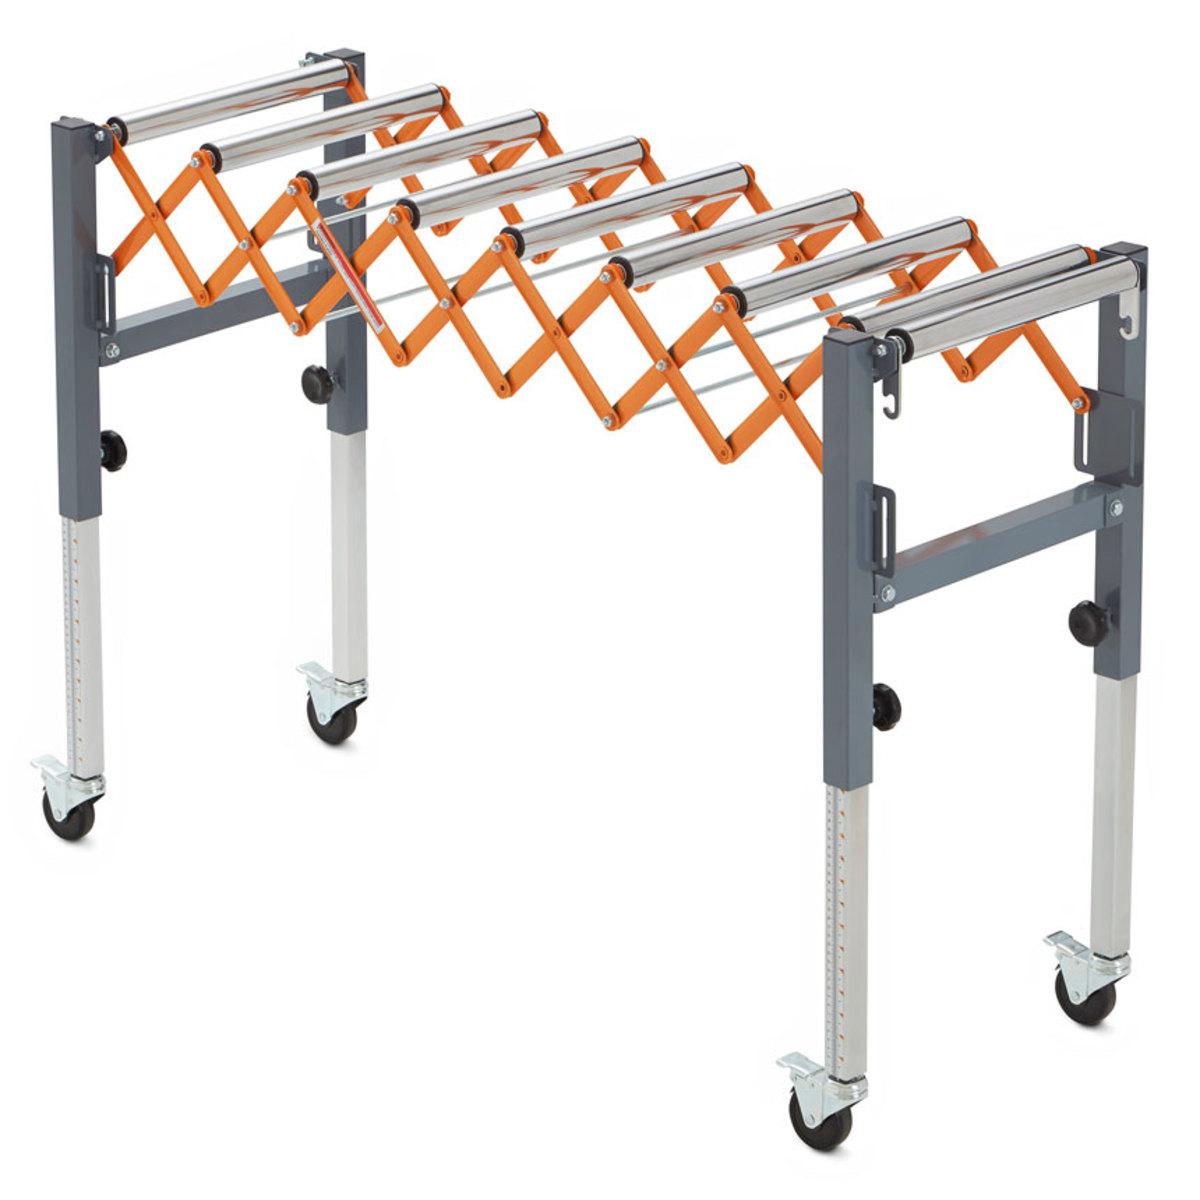 New Portable Conveyor Roller From Bora Tool Woodshop News